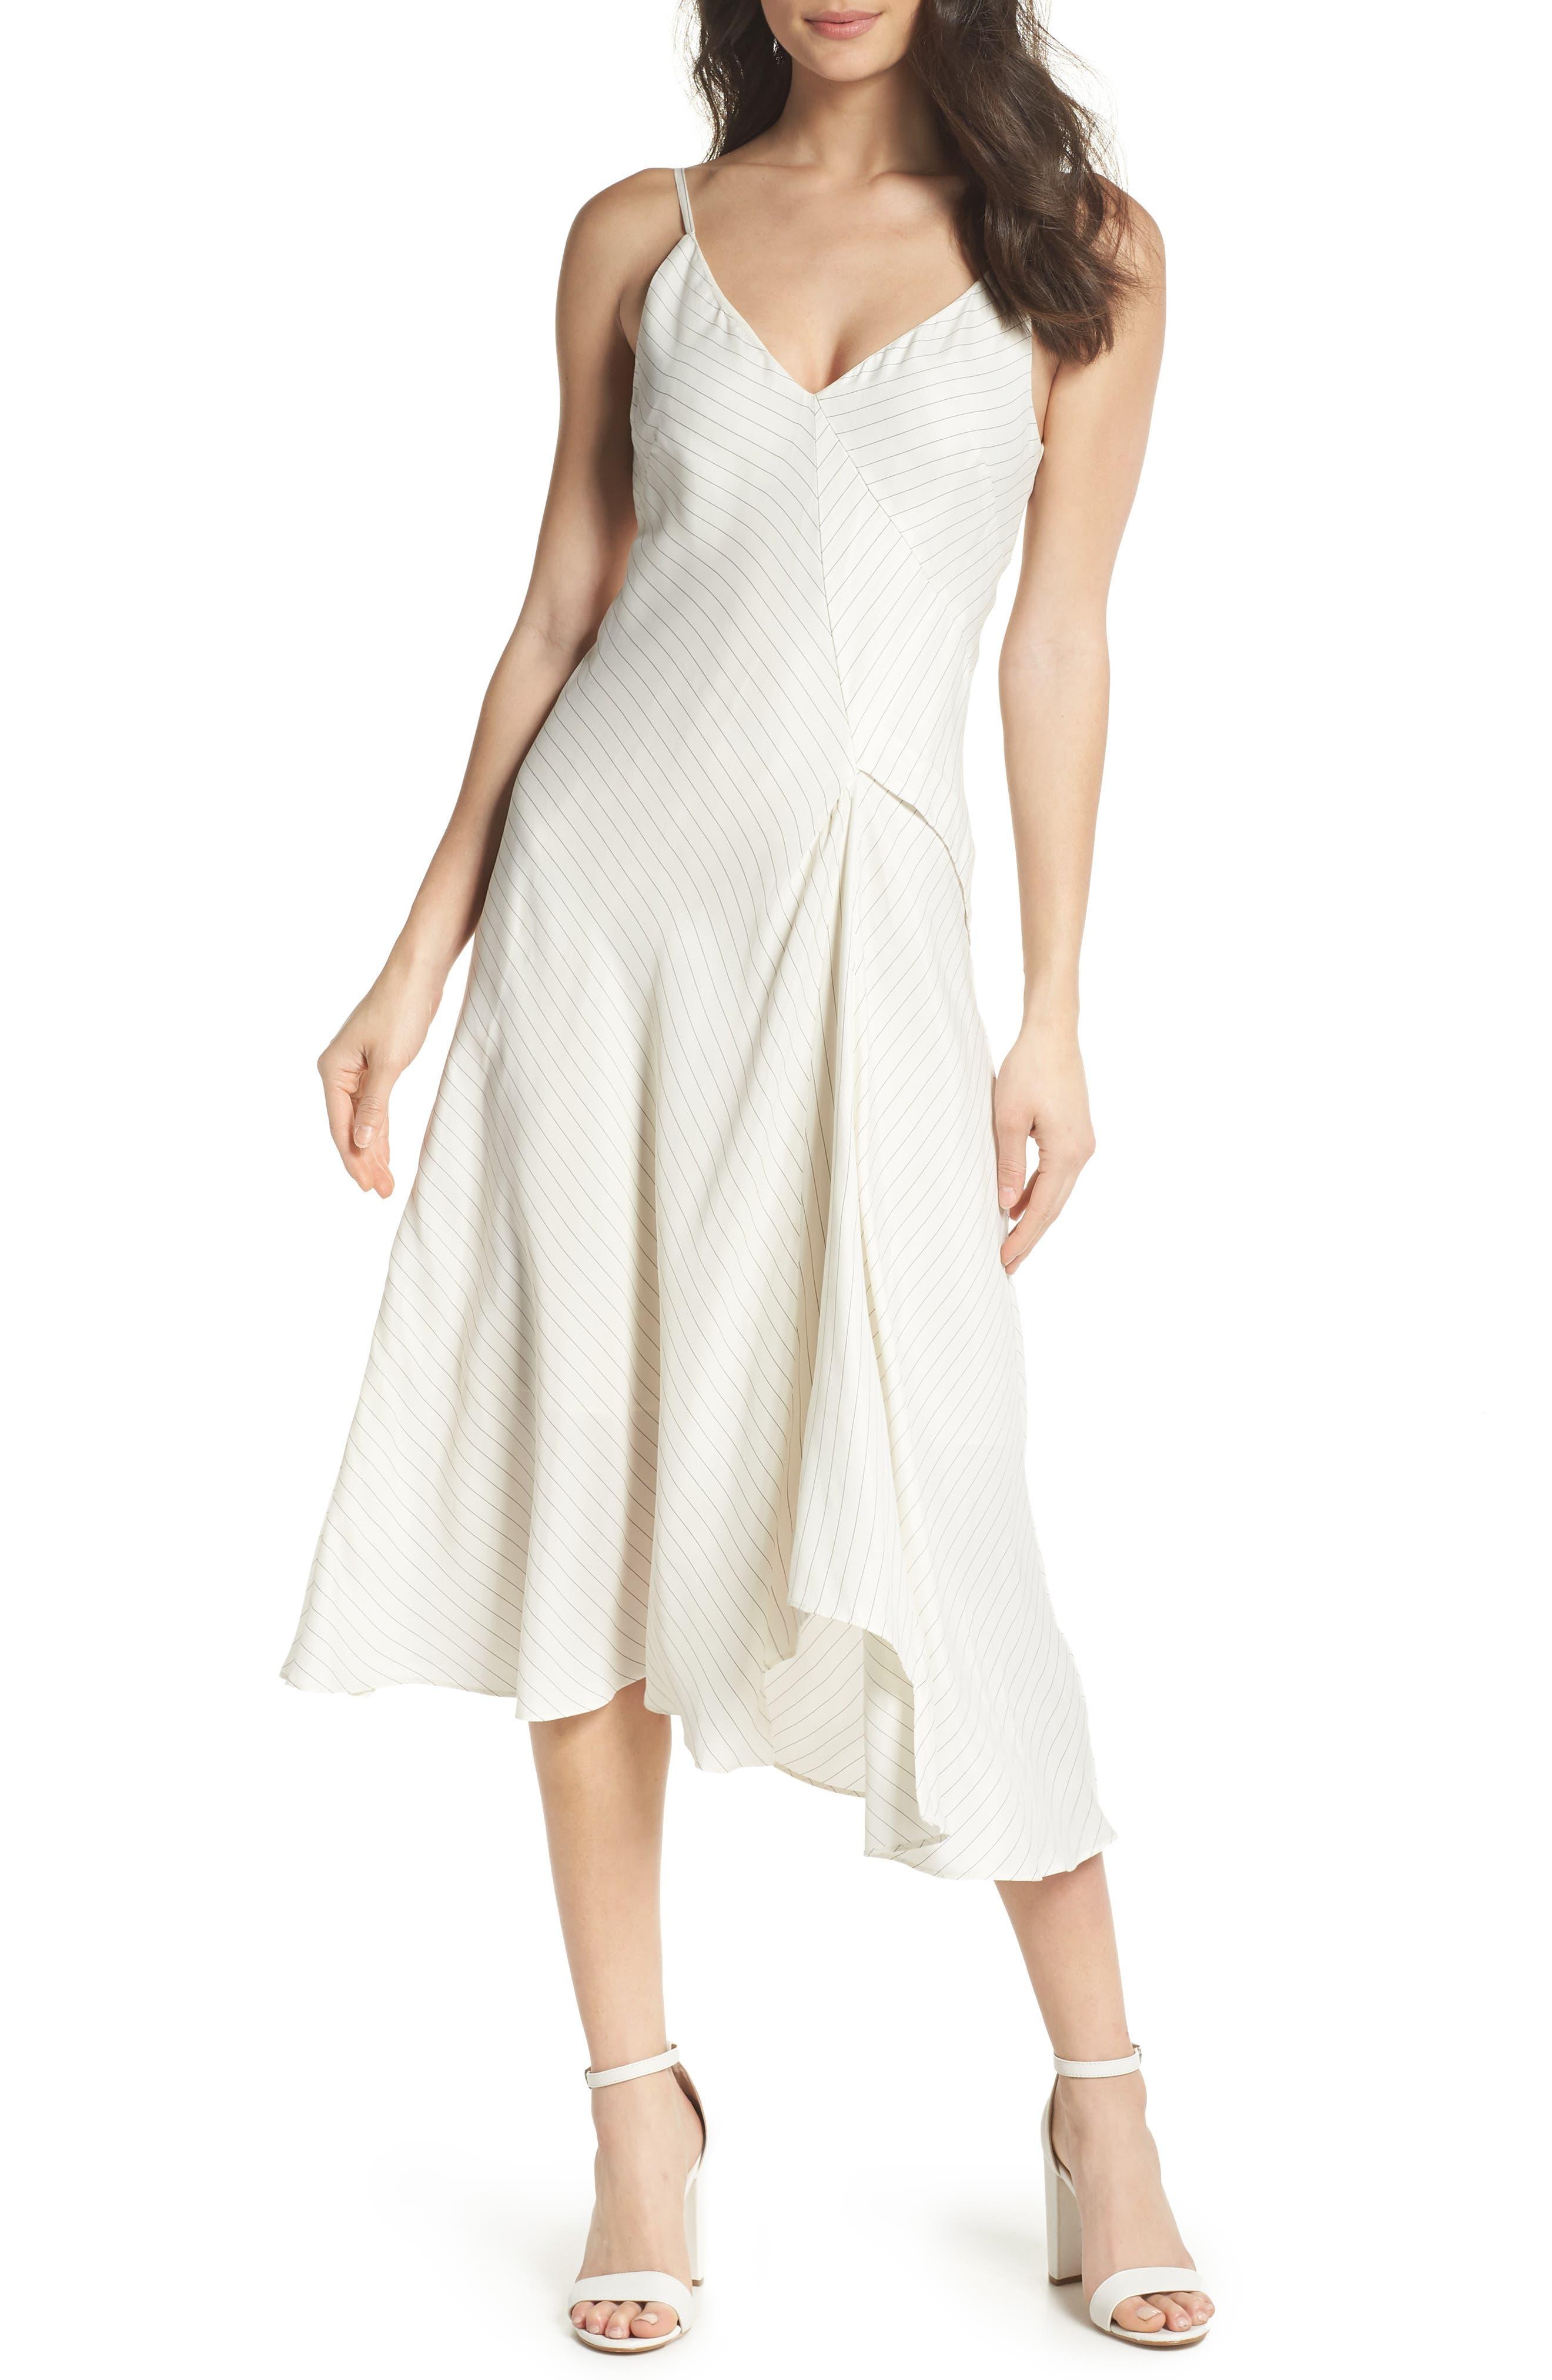 Bay Area Pinstripe Asymmetric Midi Dress,                         Main,                         color, 105